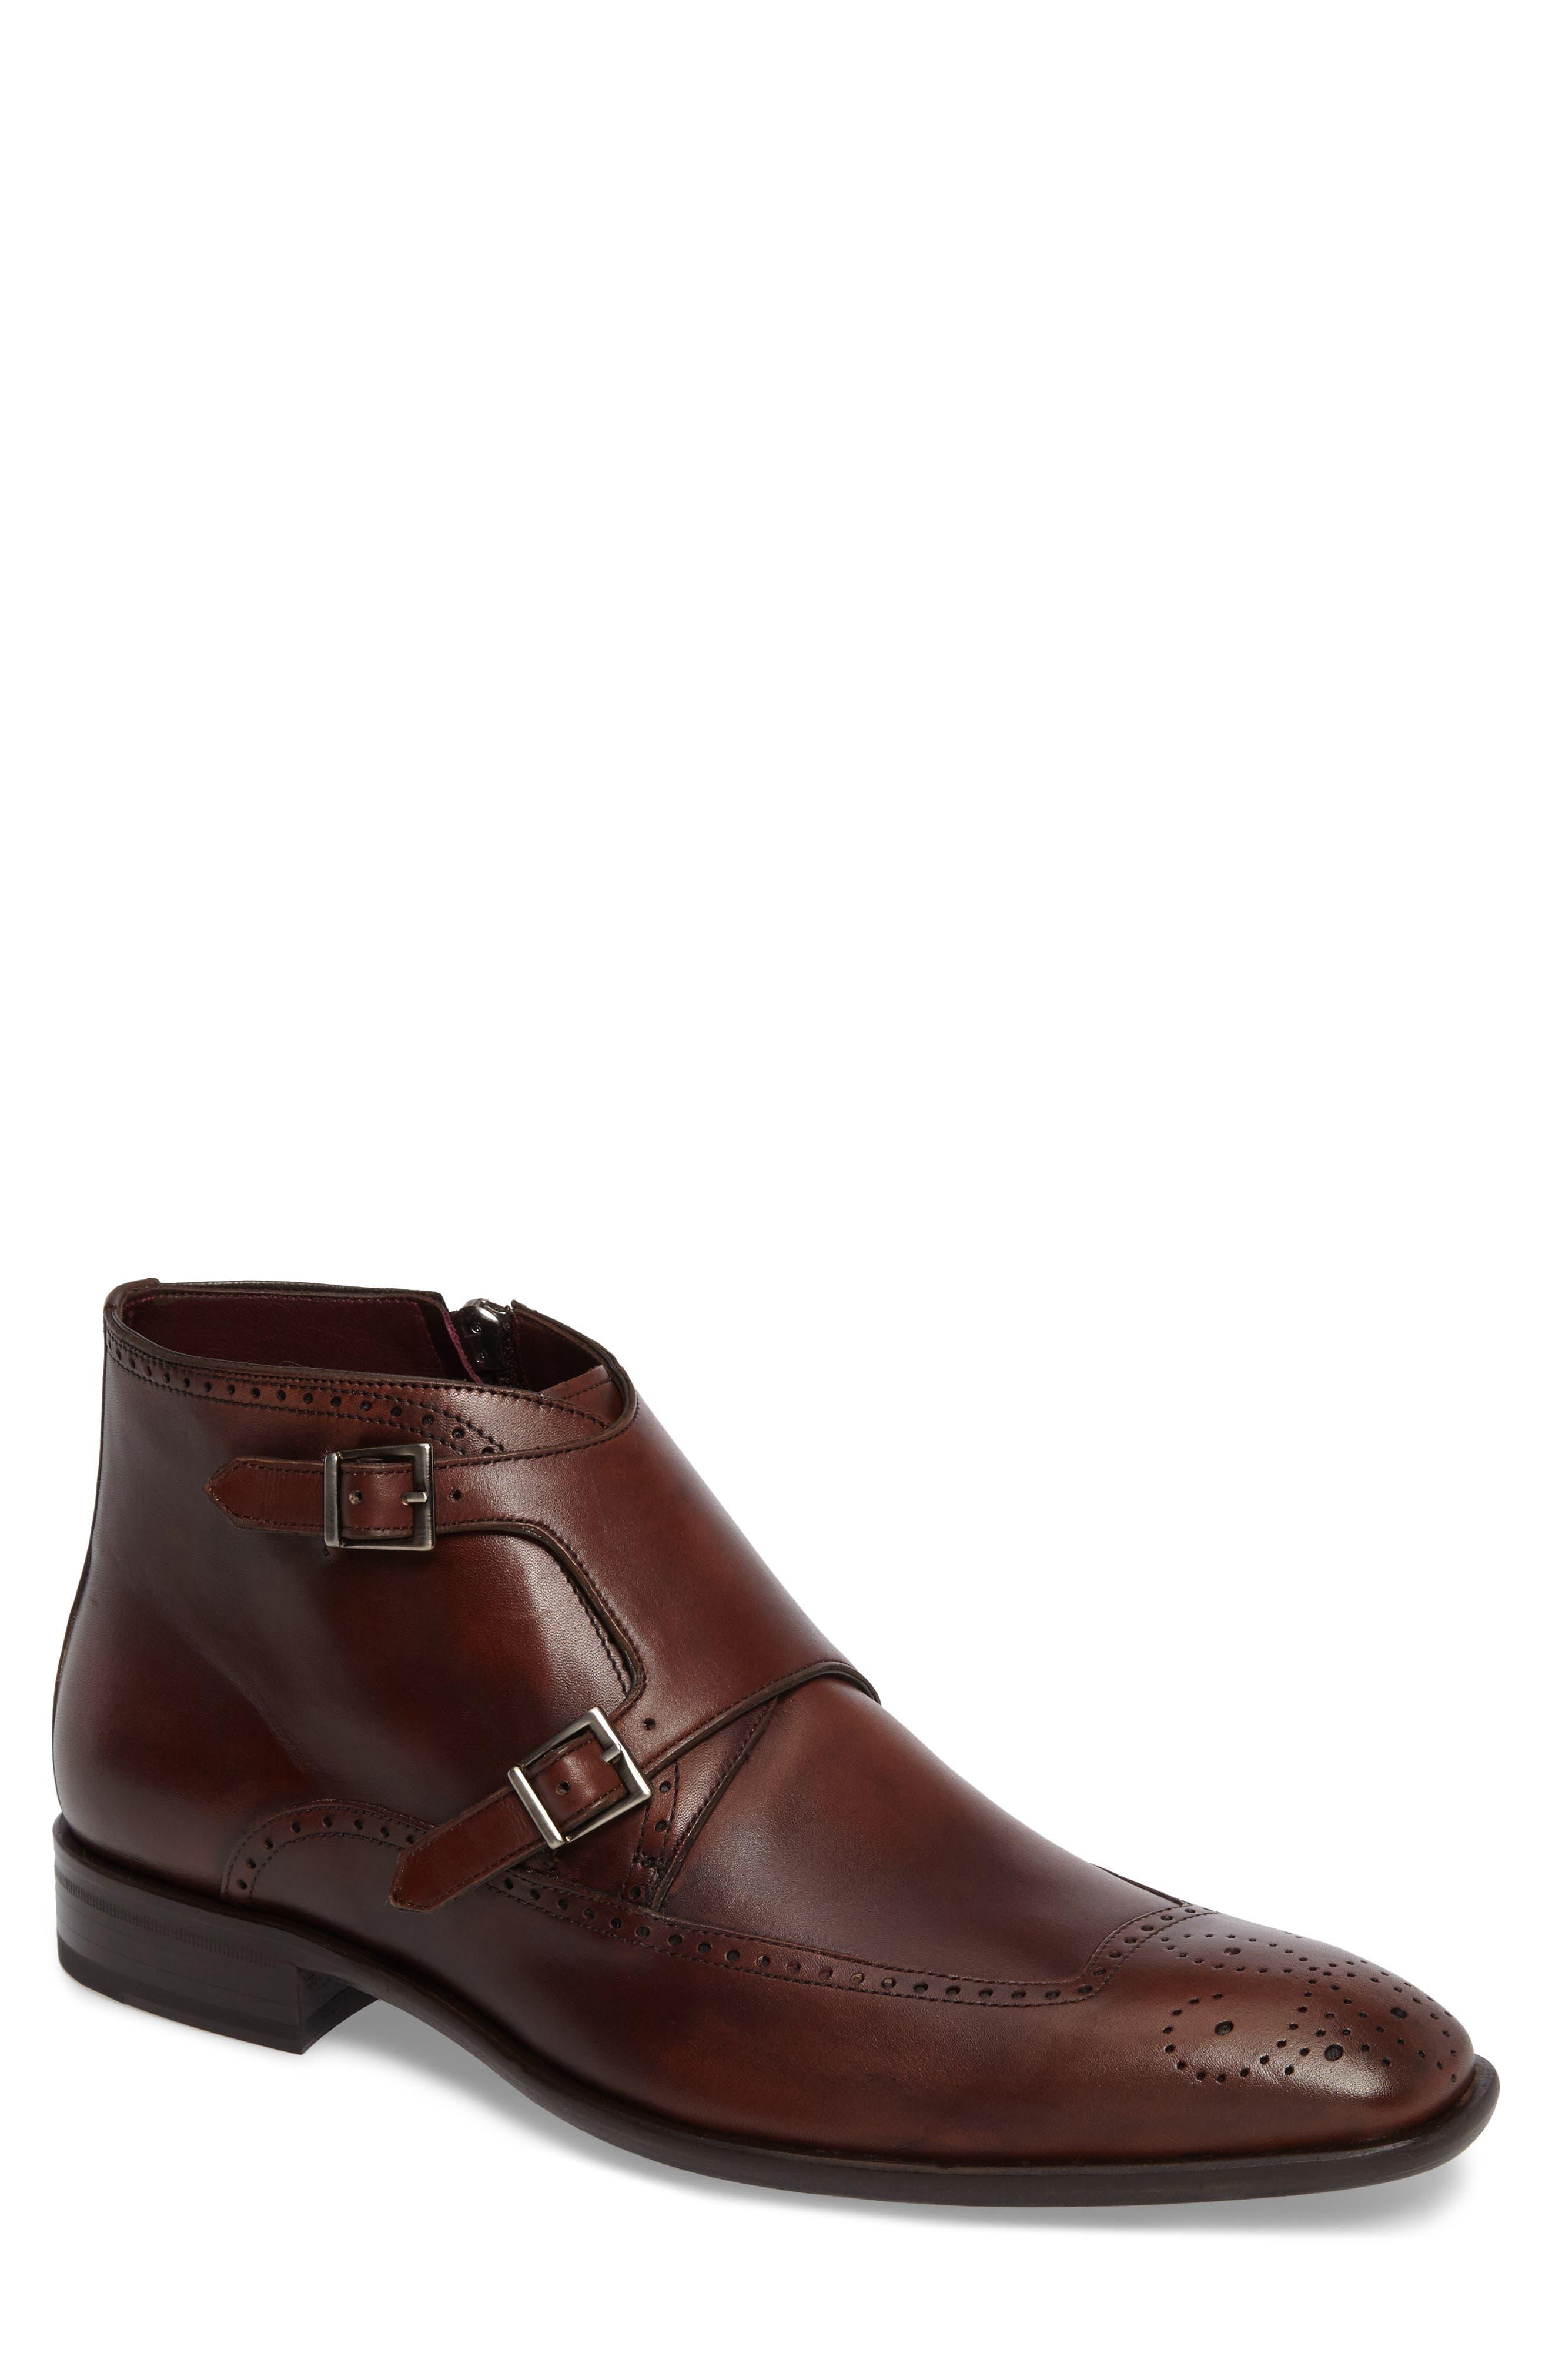 Taberna Double Monk Strap Boot,                         Main,                         color, Cognac Leather